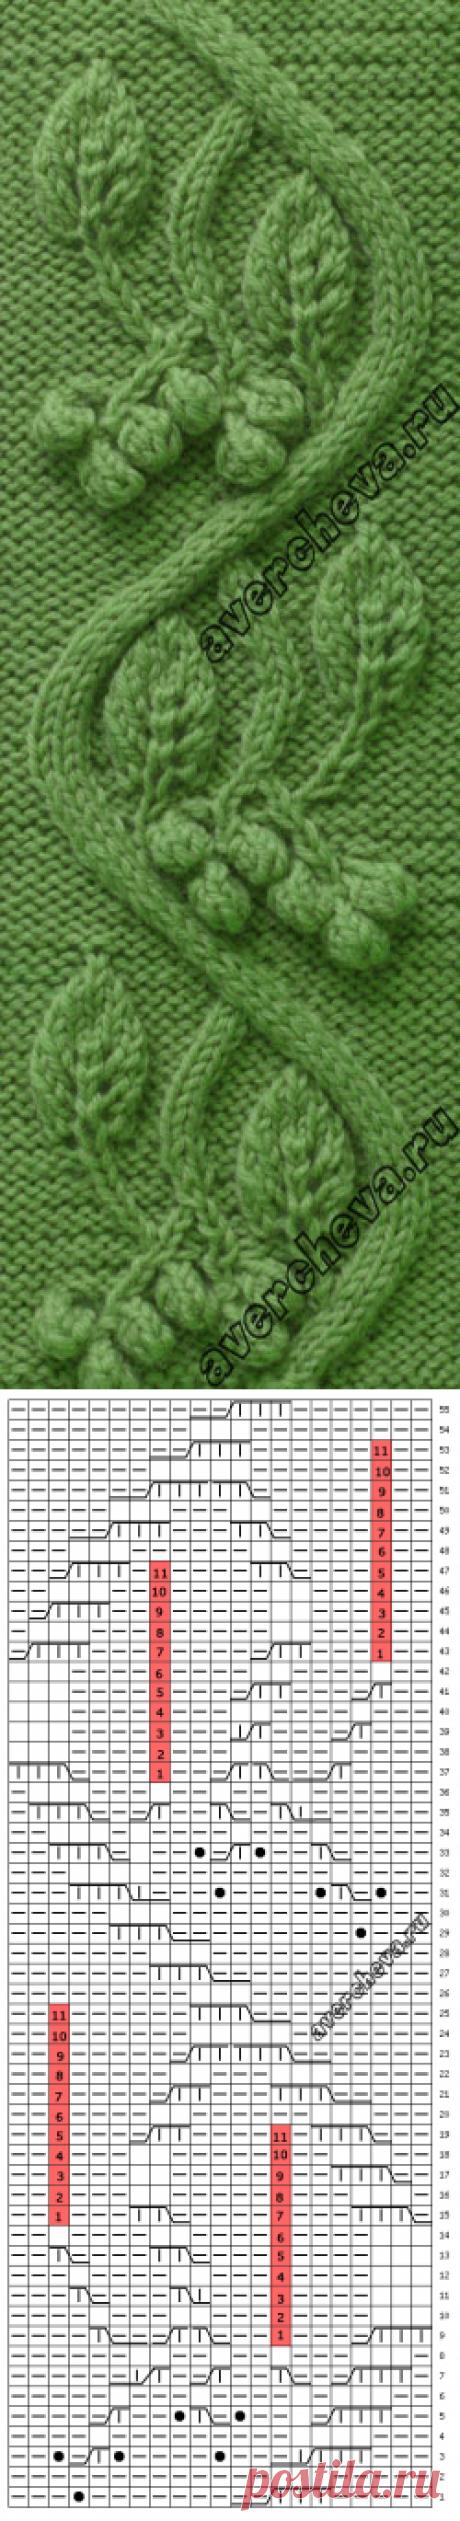 "pattern 691keltskaya grapevine\"" | catalog knitted spokes of patterns"